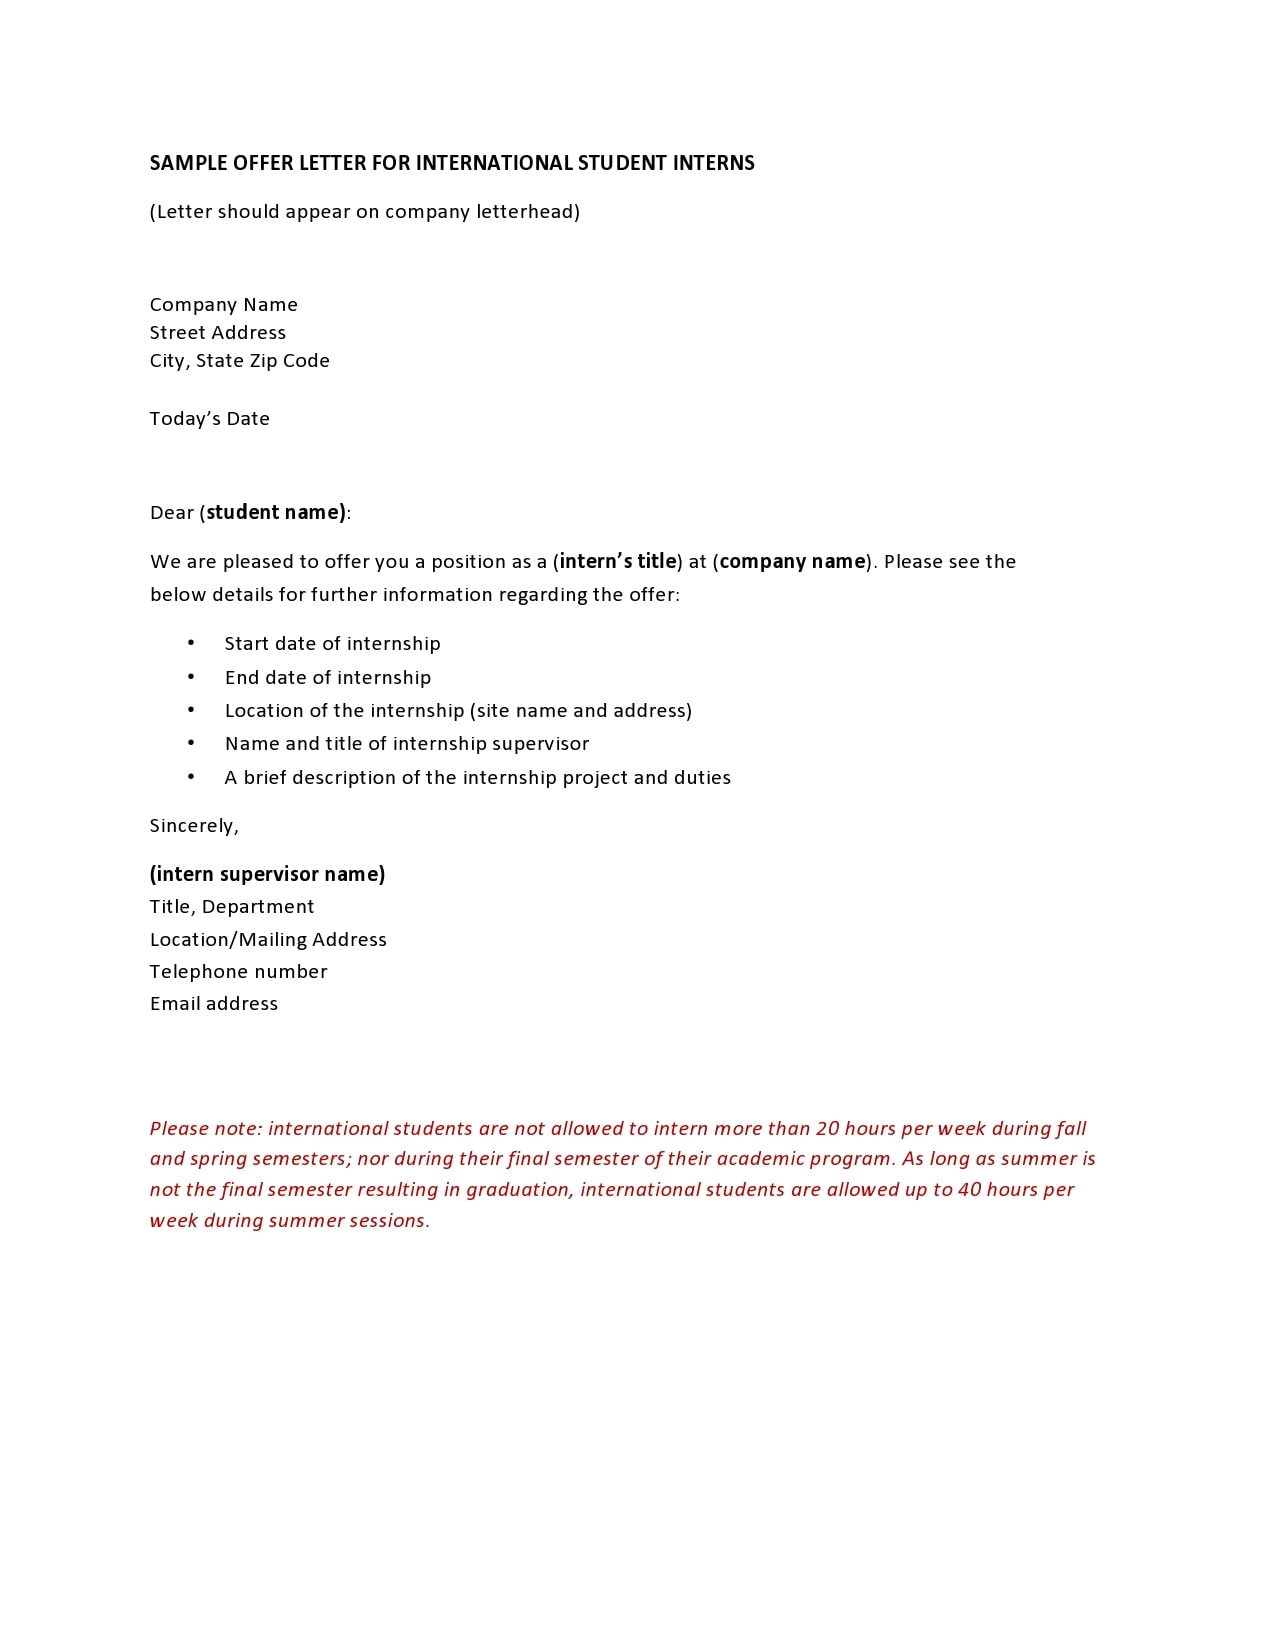 internship offer letter 14